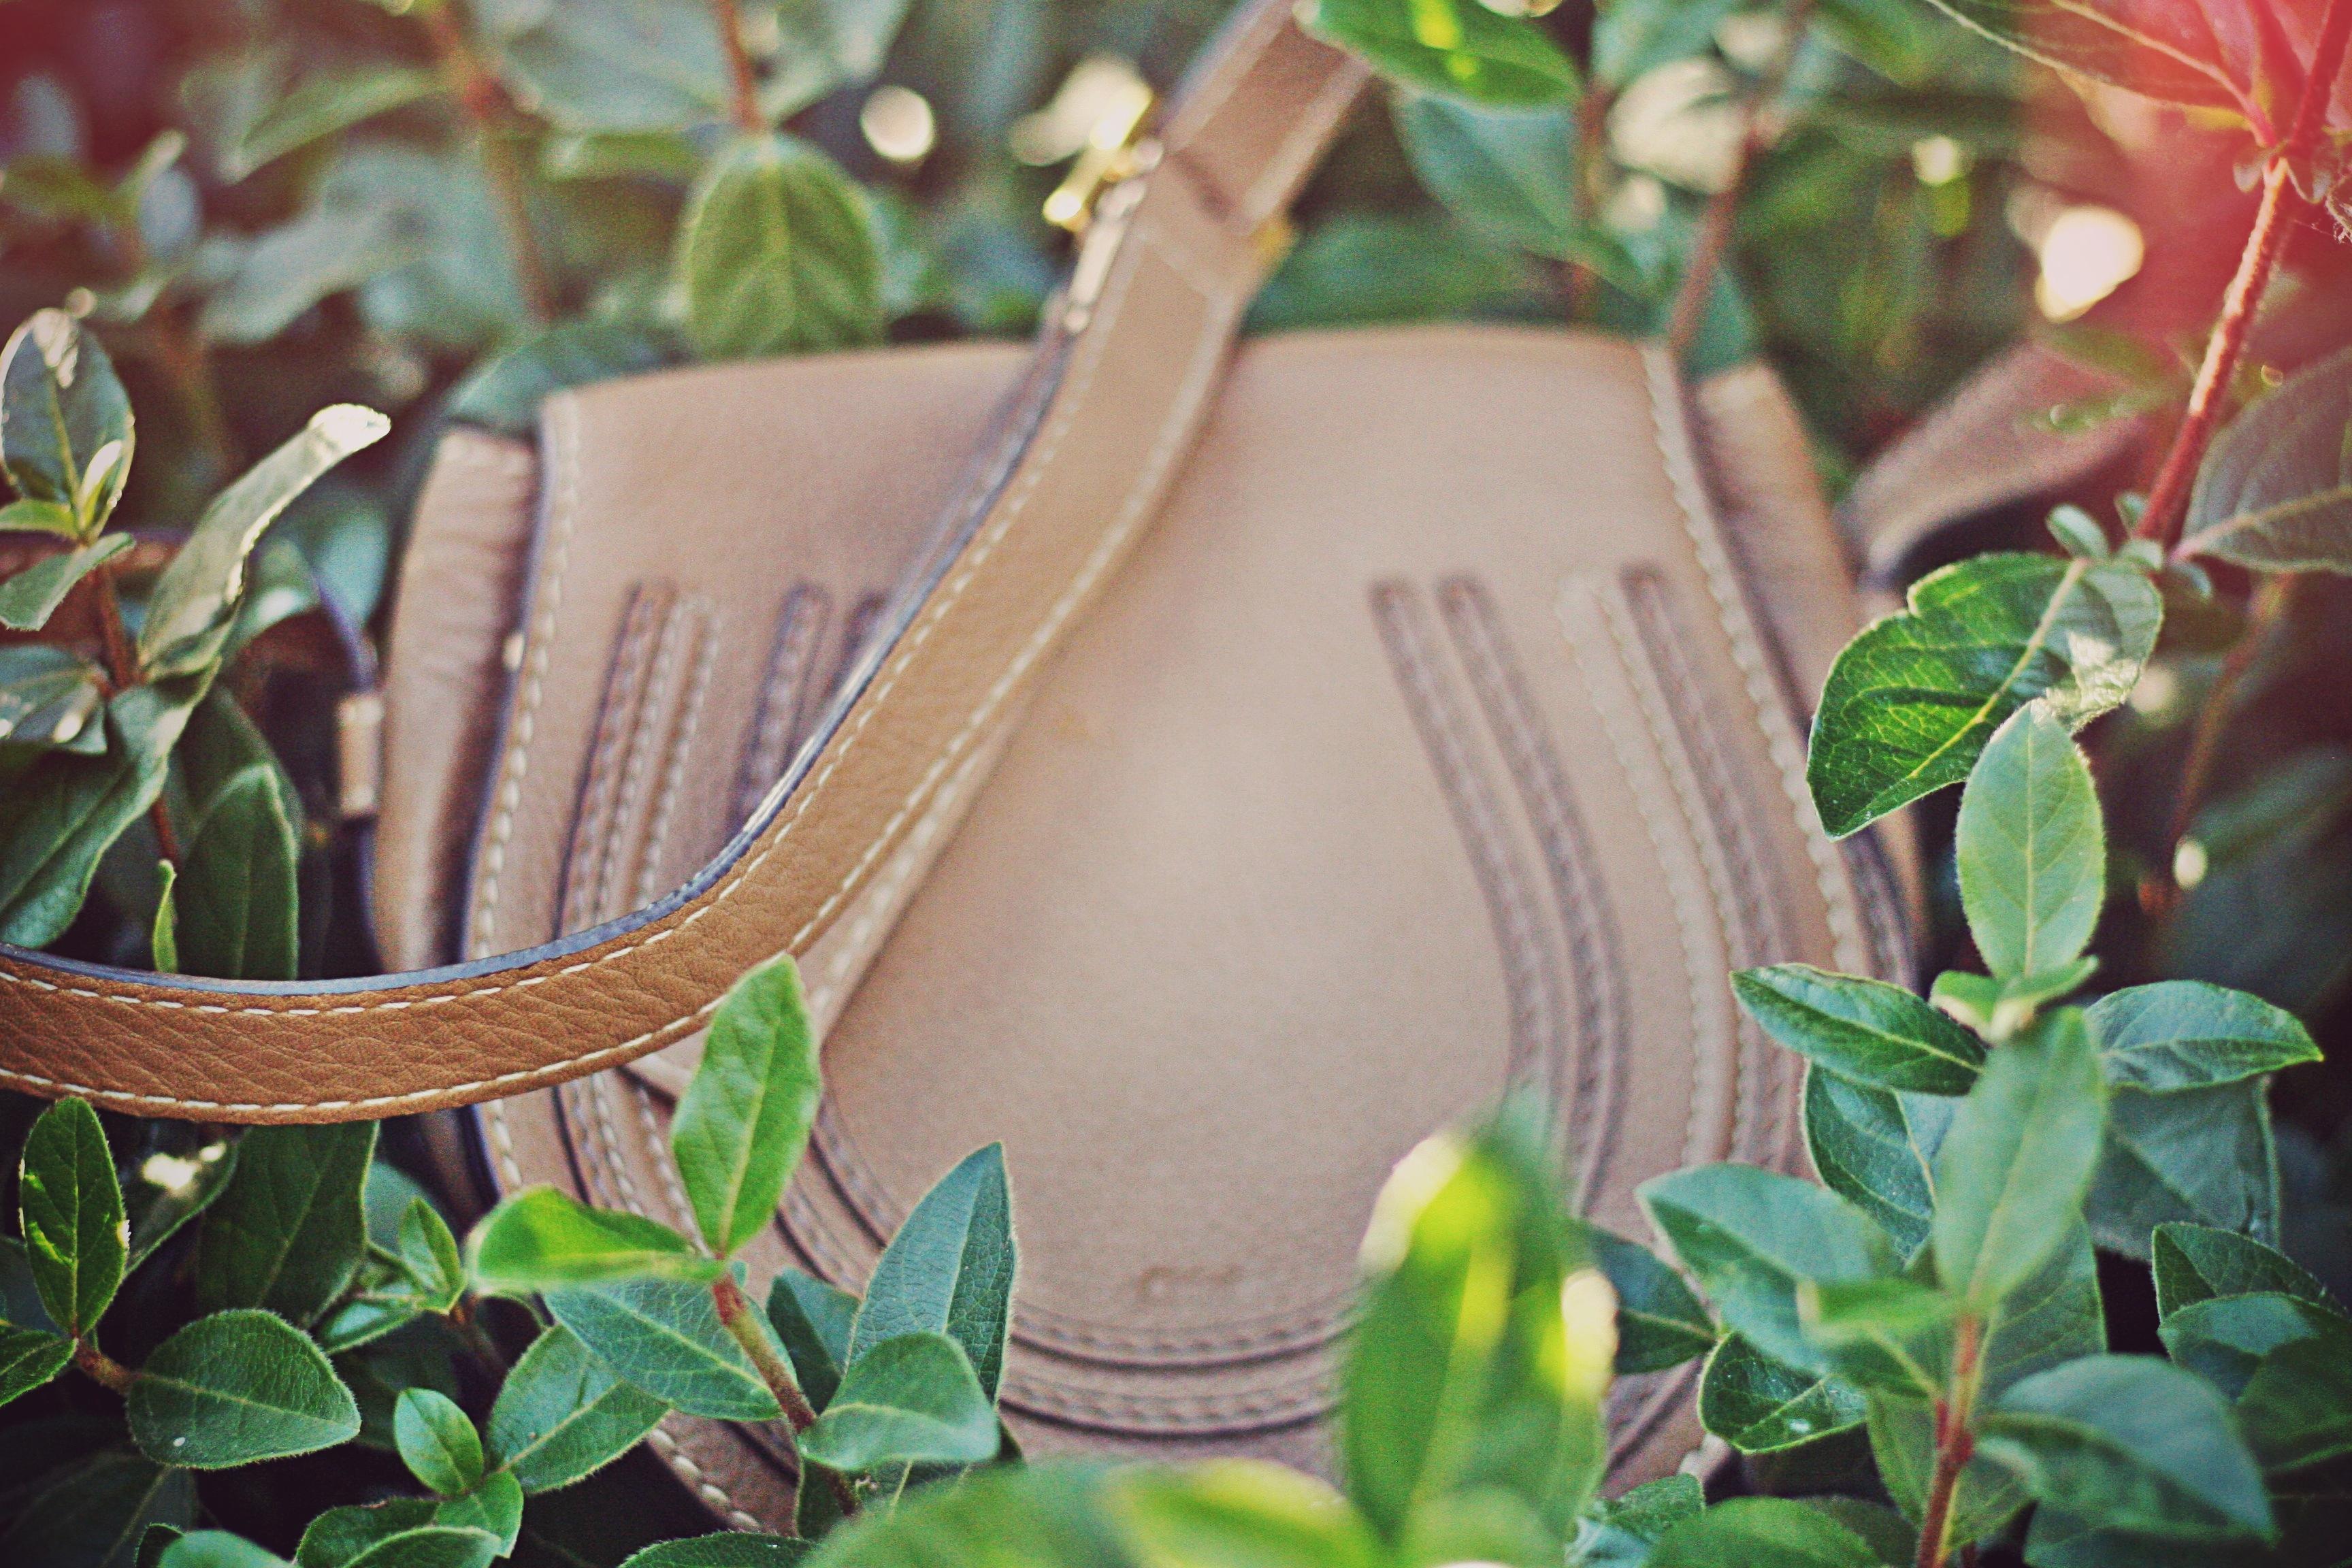 sac-chloe-marcie-aurelia-blog-mode